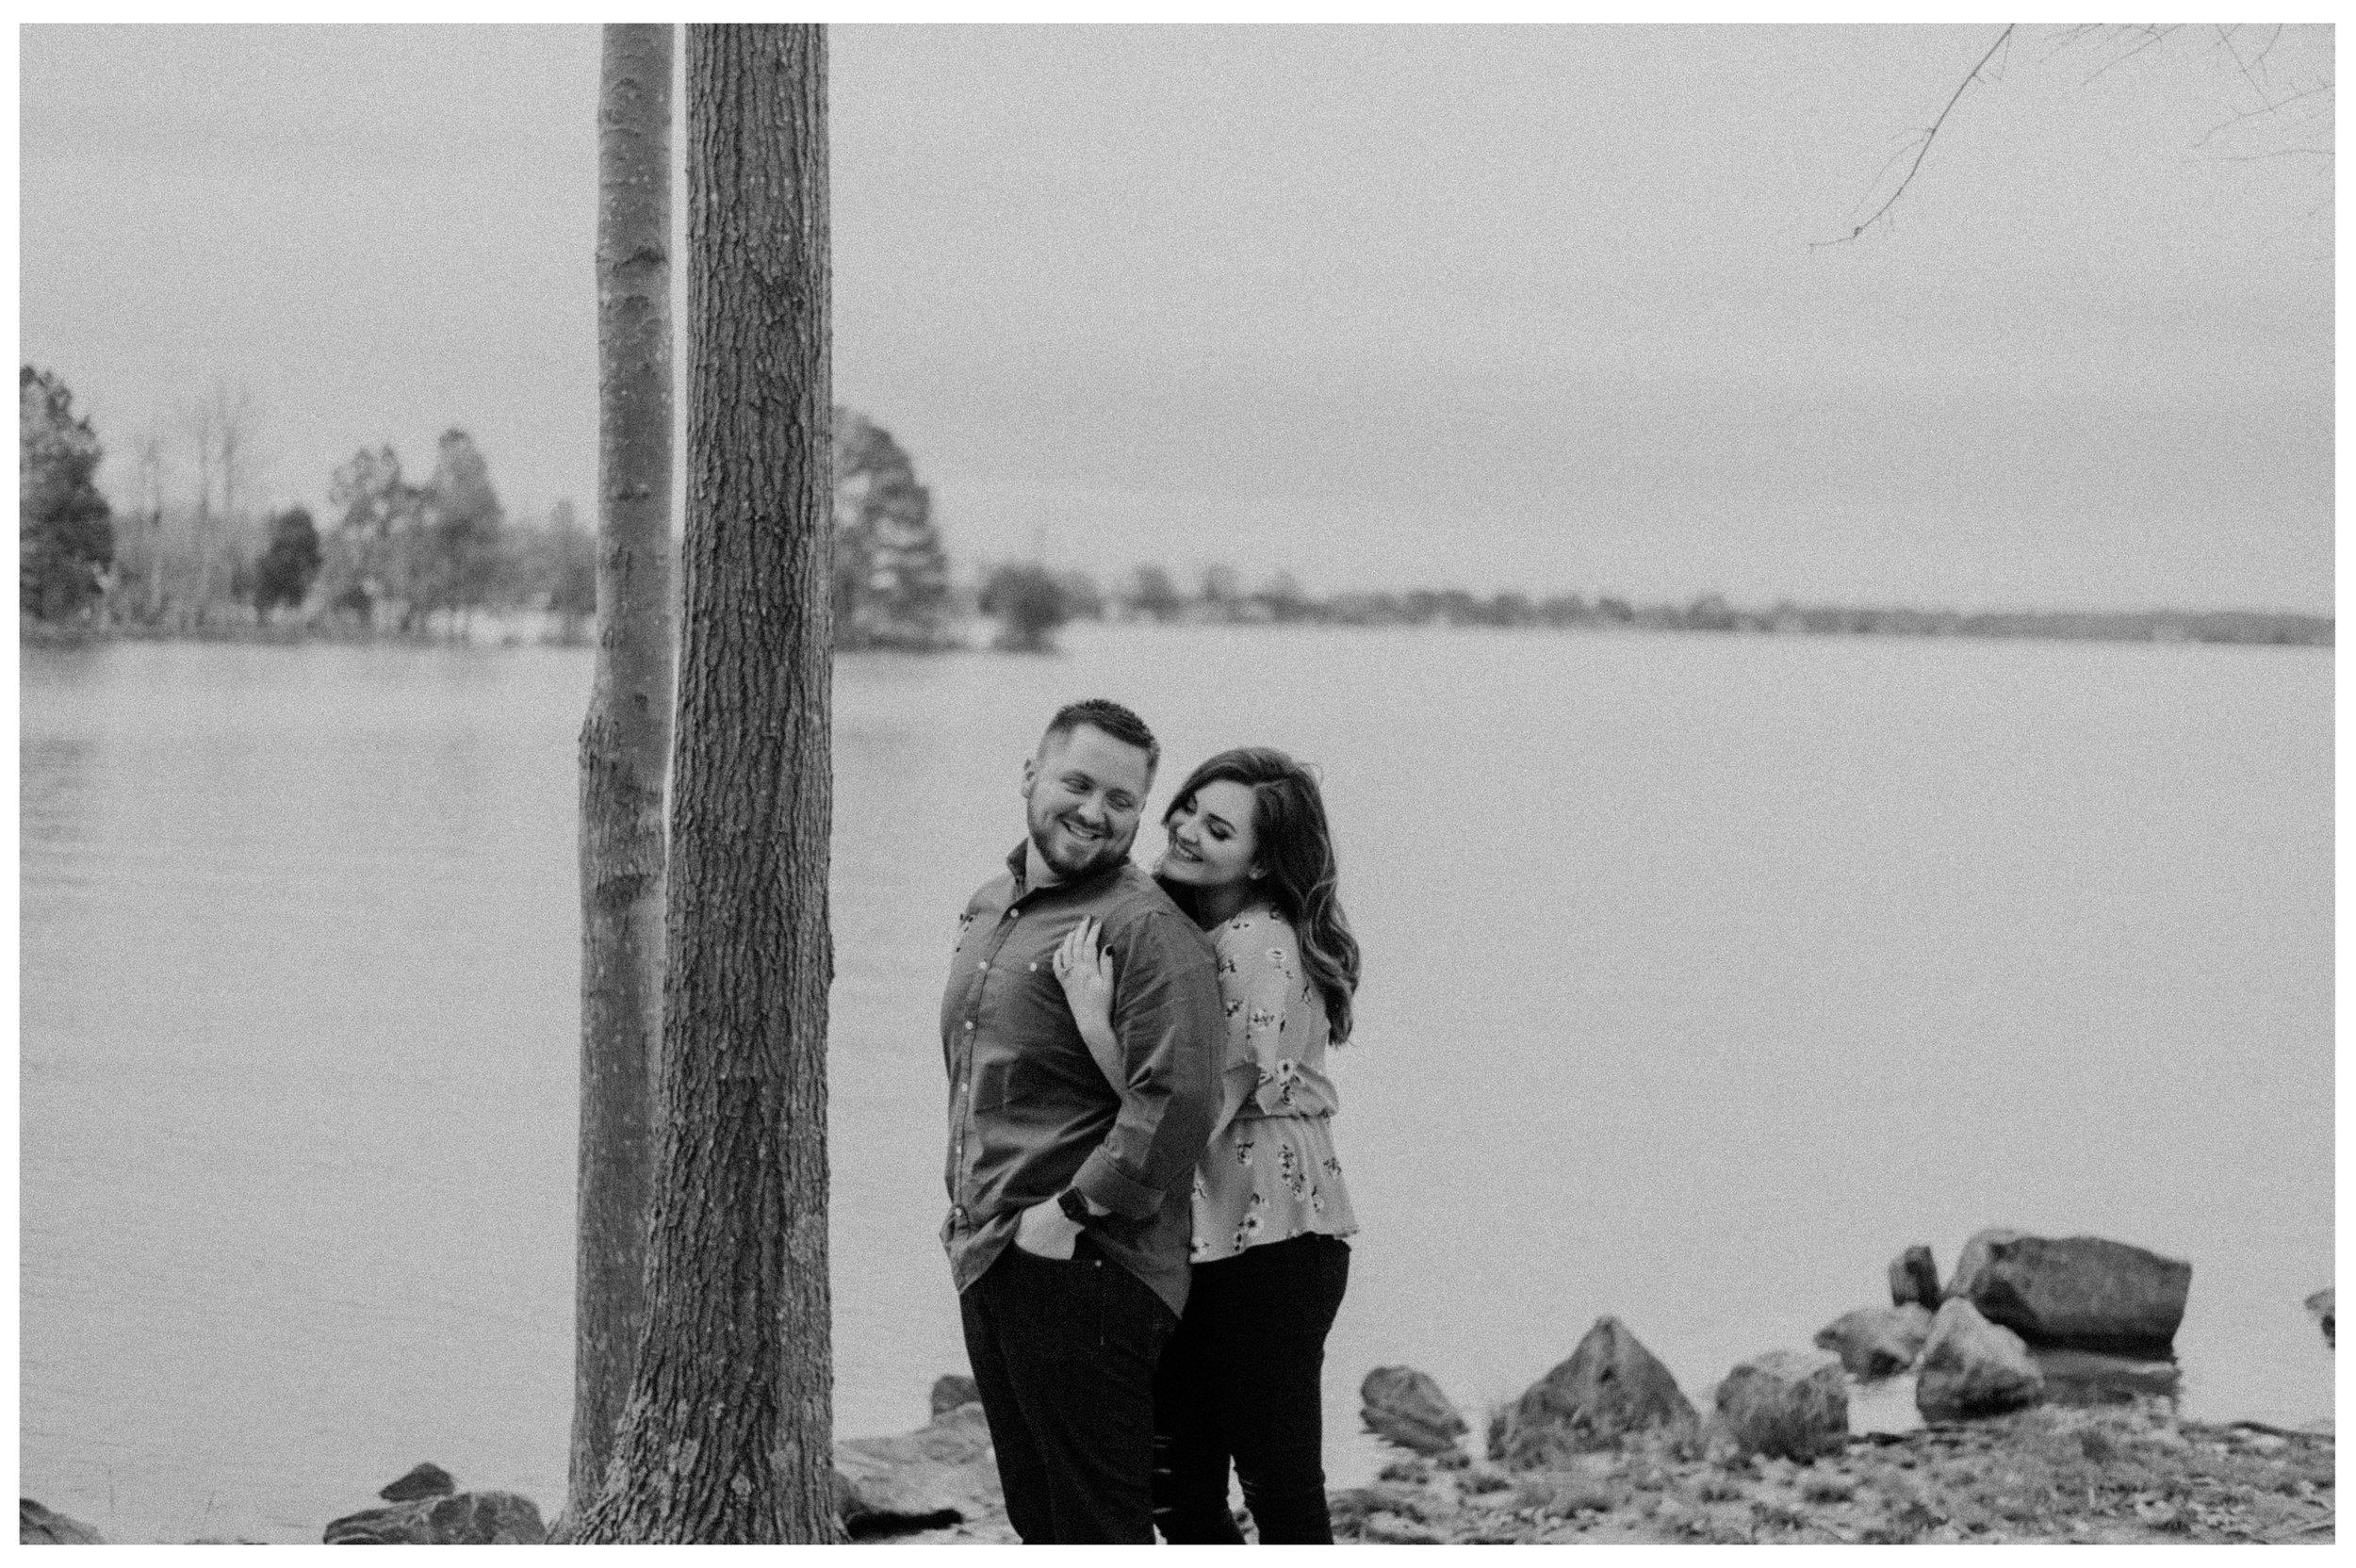 Emiley & Dustin 10.jpg